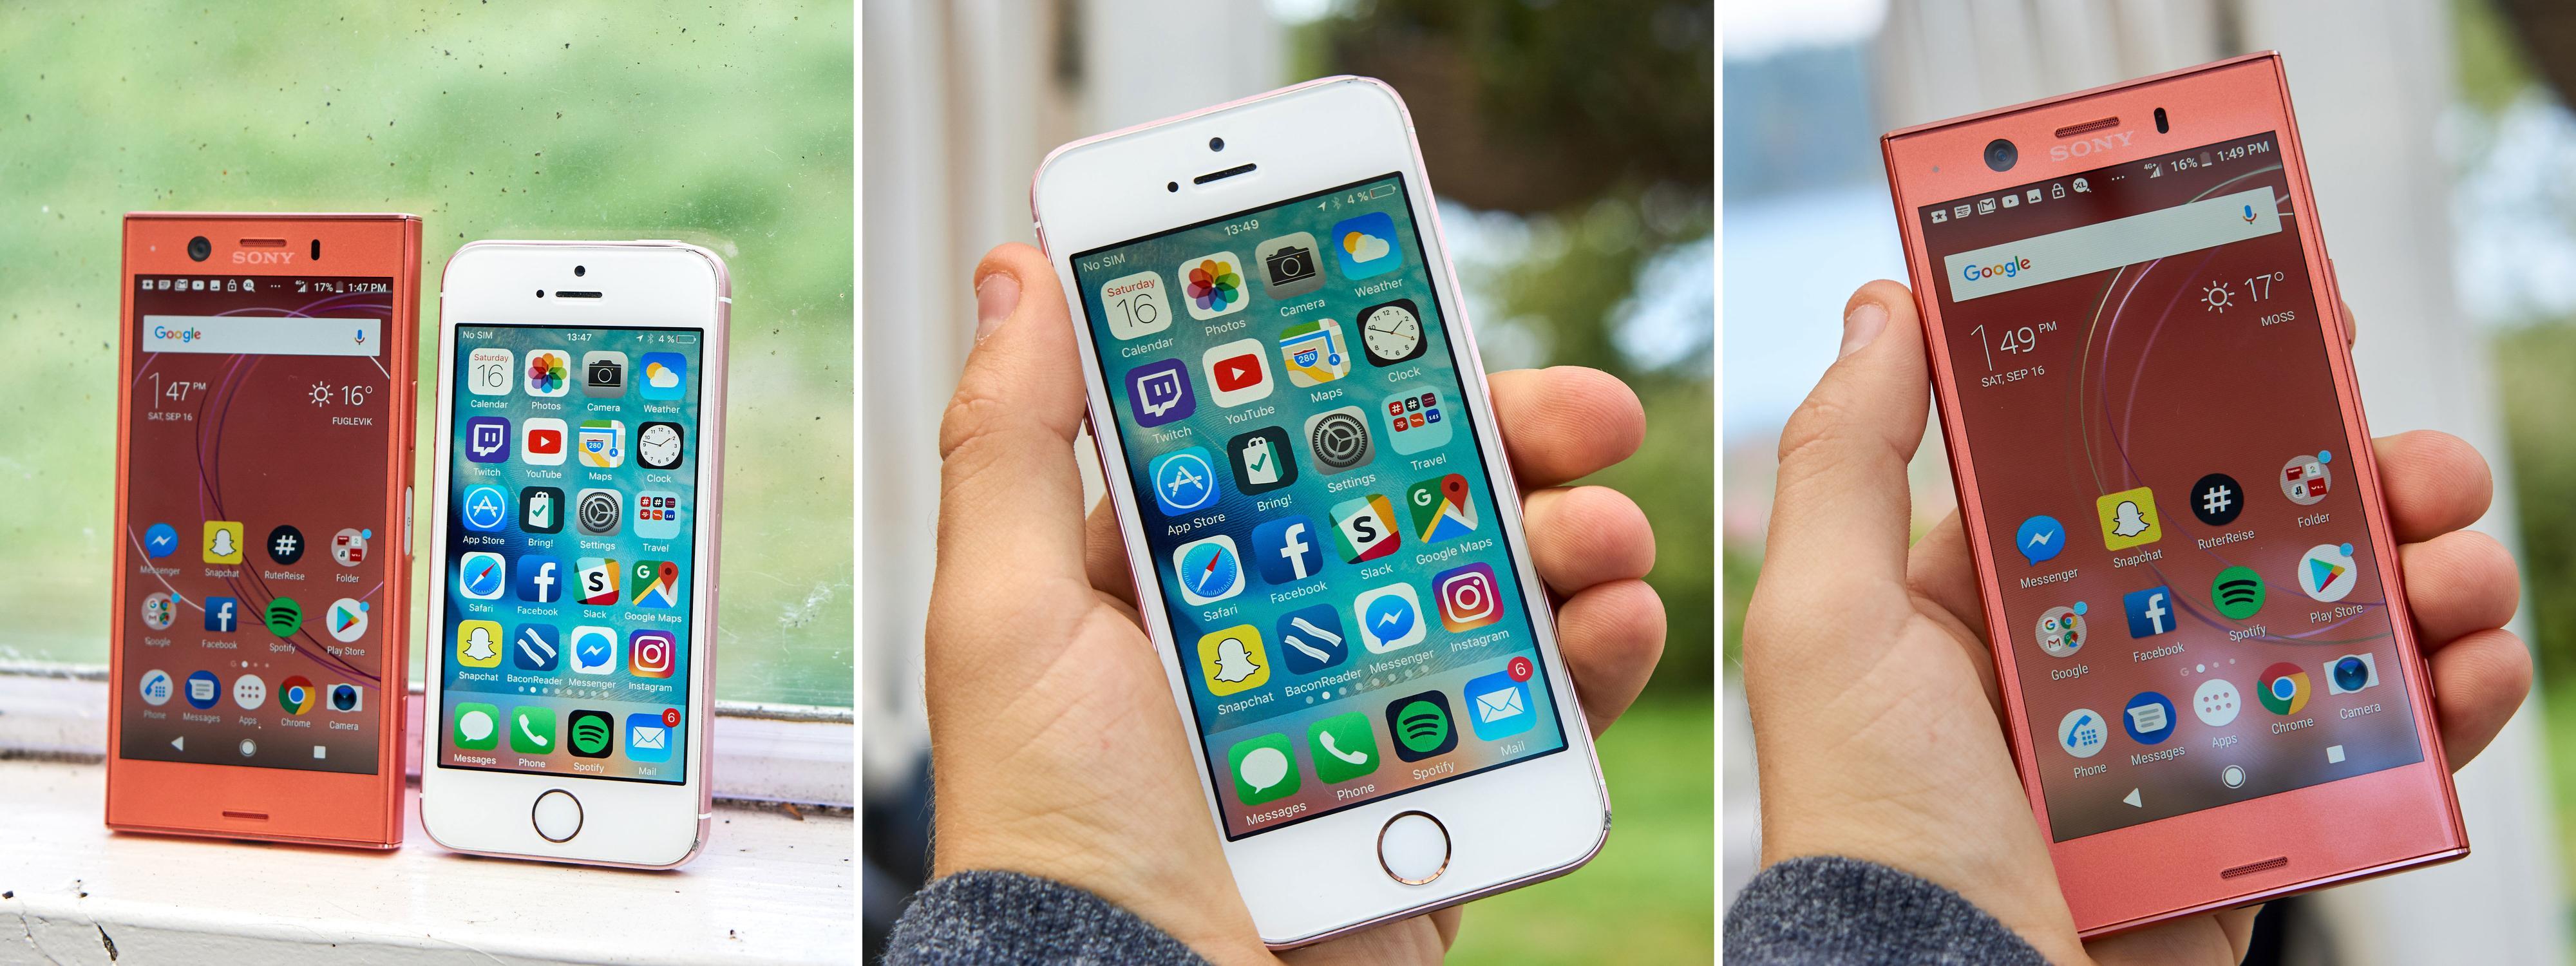 Størrelsesmessig er det kun iPhone SE som kan tukte Xperia-en.